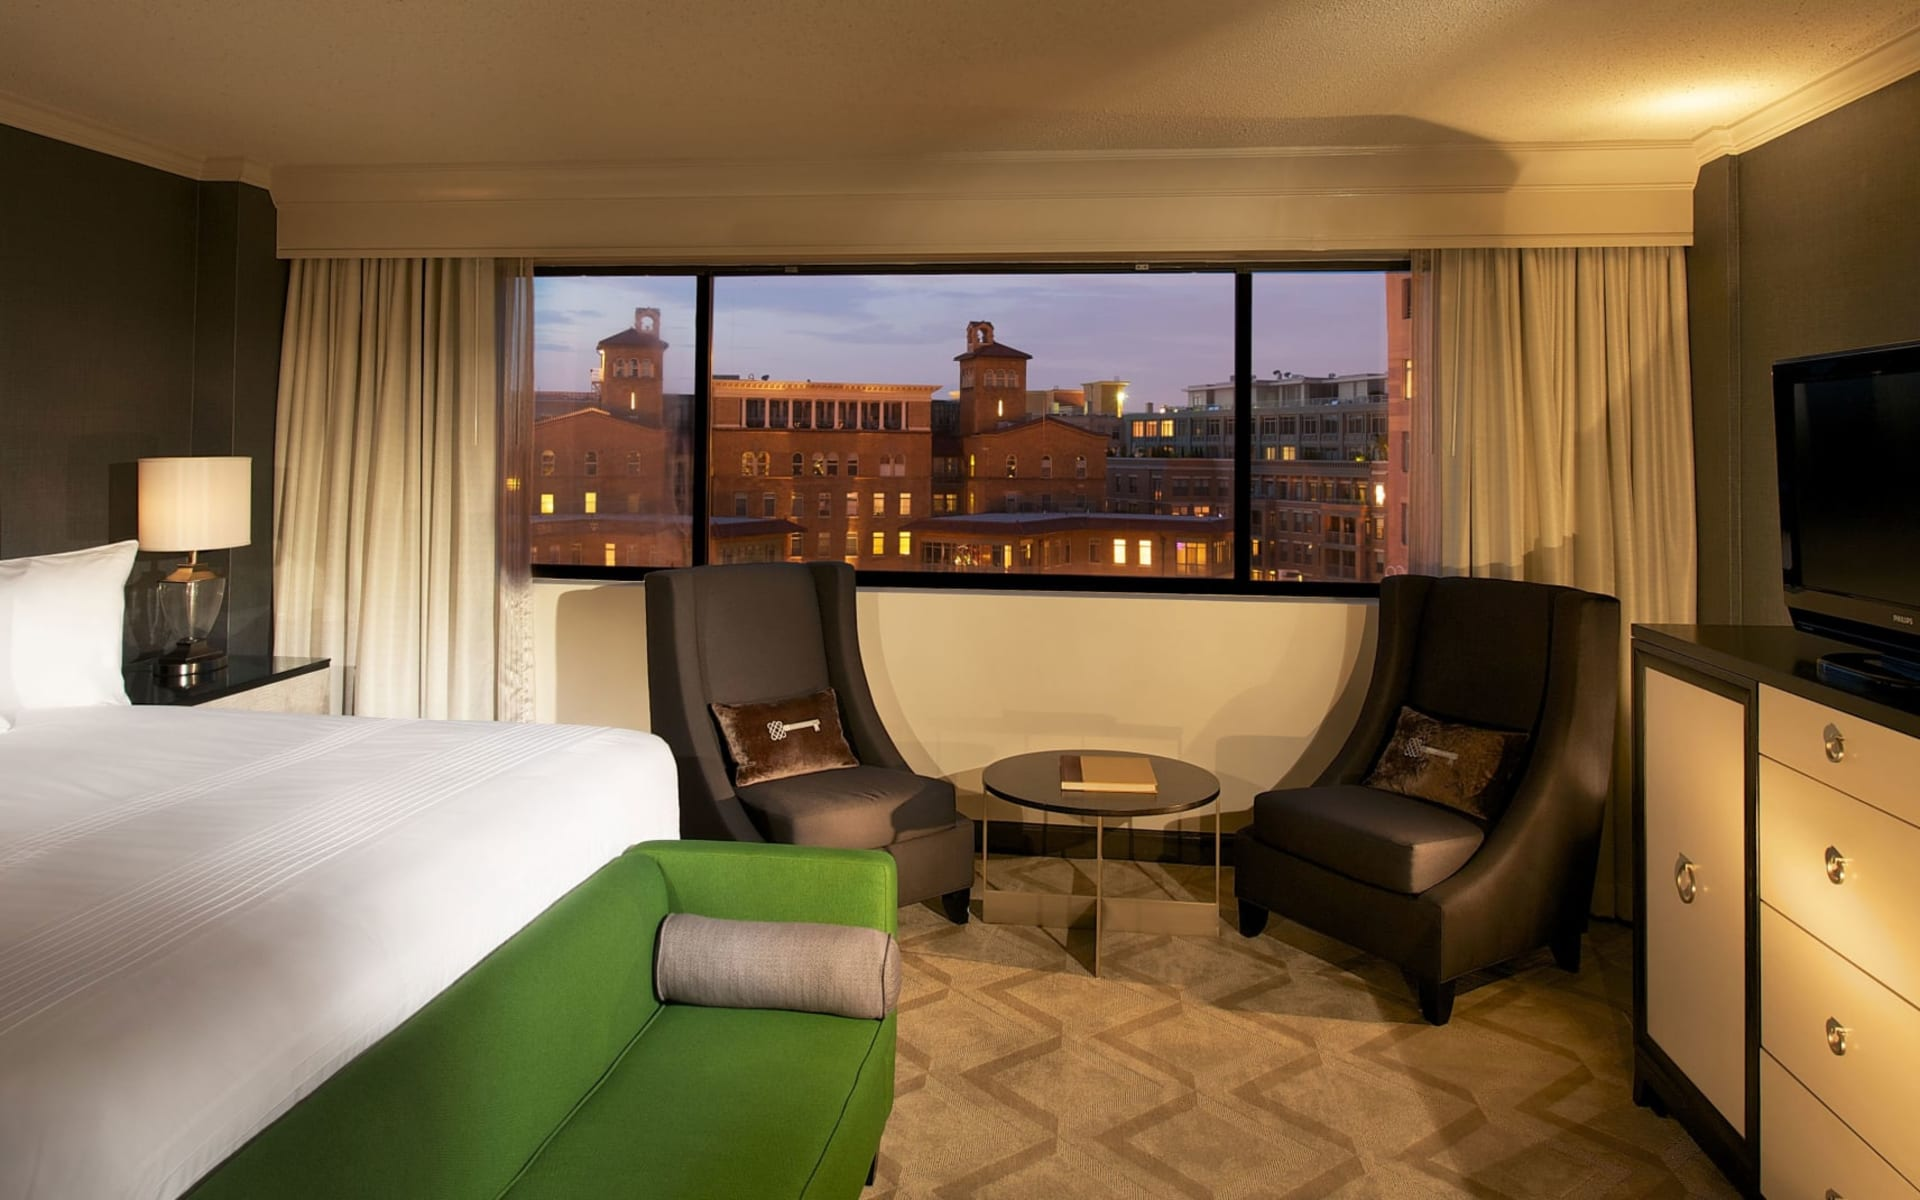 Melrose Georgetown Hotel in Washington D.C.: Room_The Melrose Georgetown_melrose_Bonotel